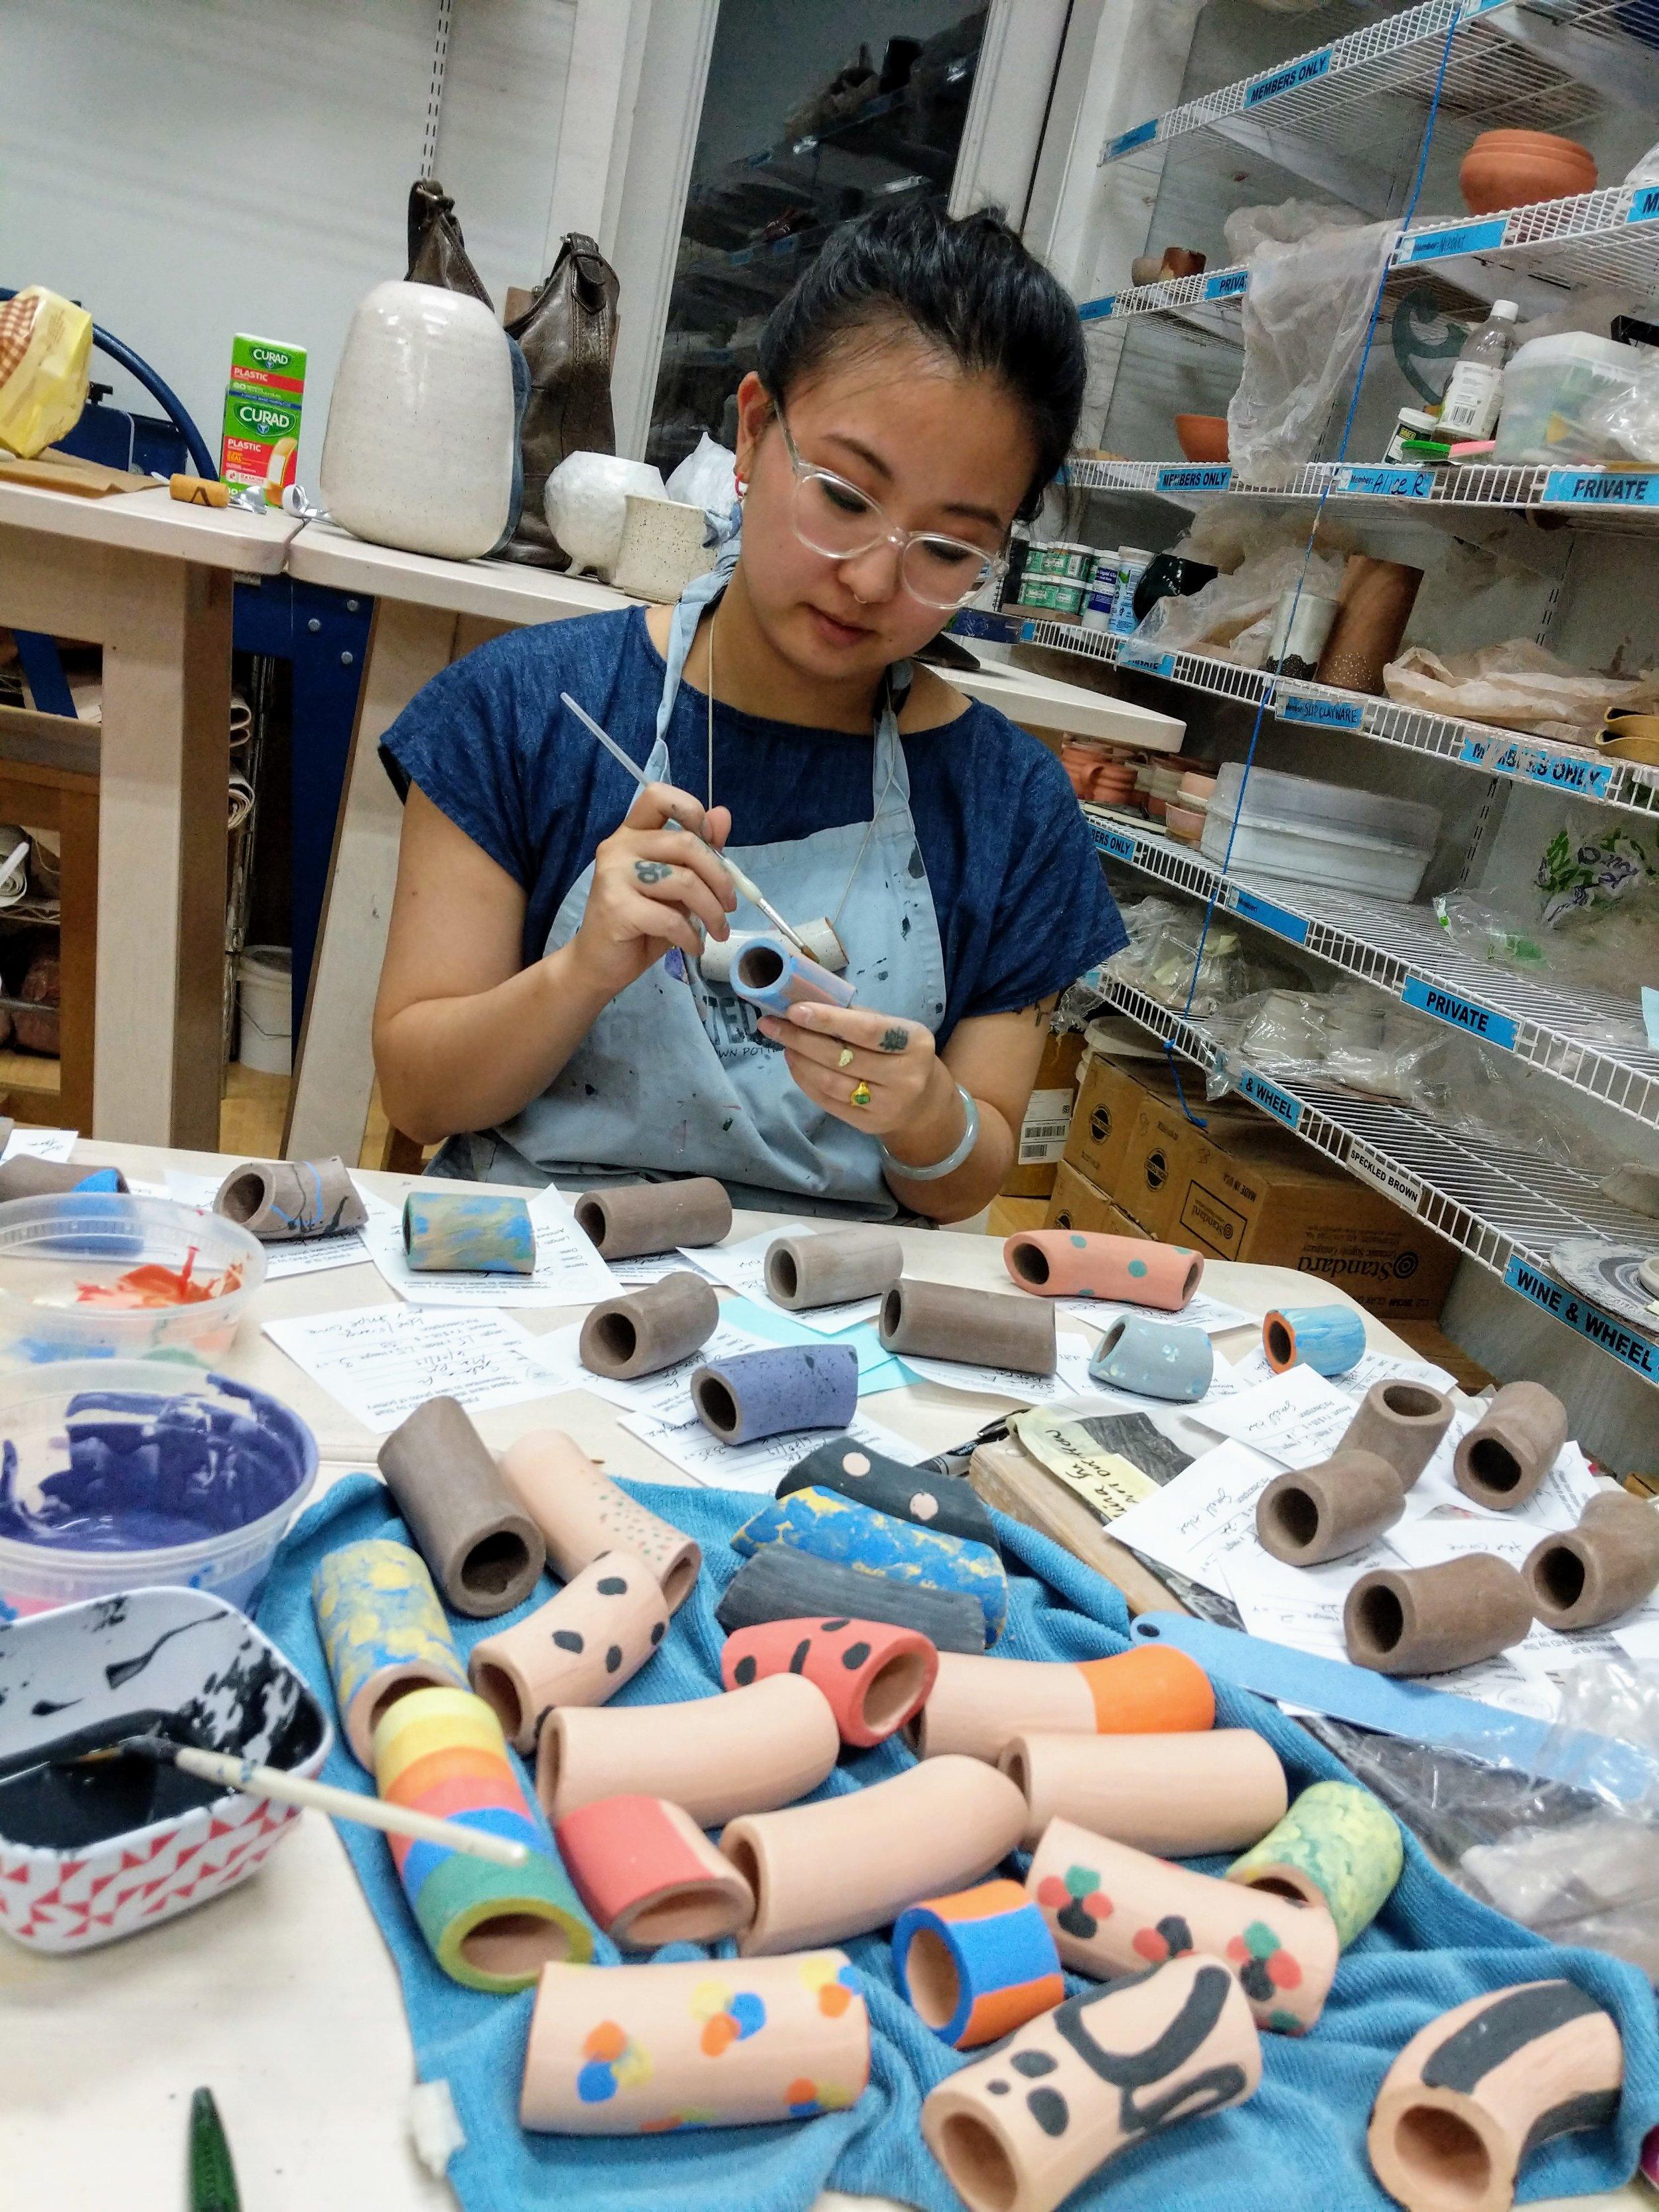 Salina working on Pottery.